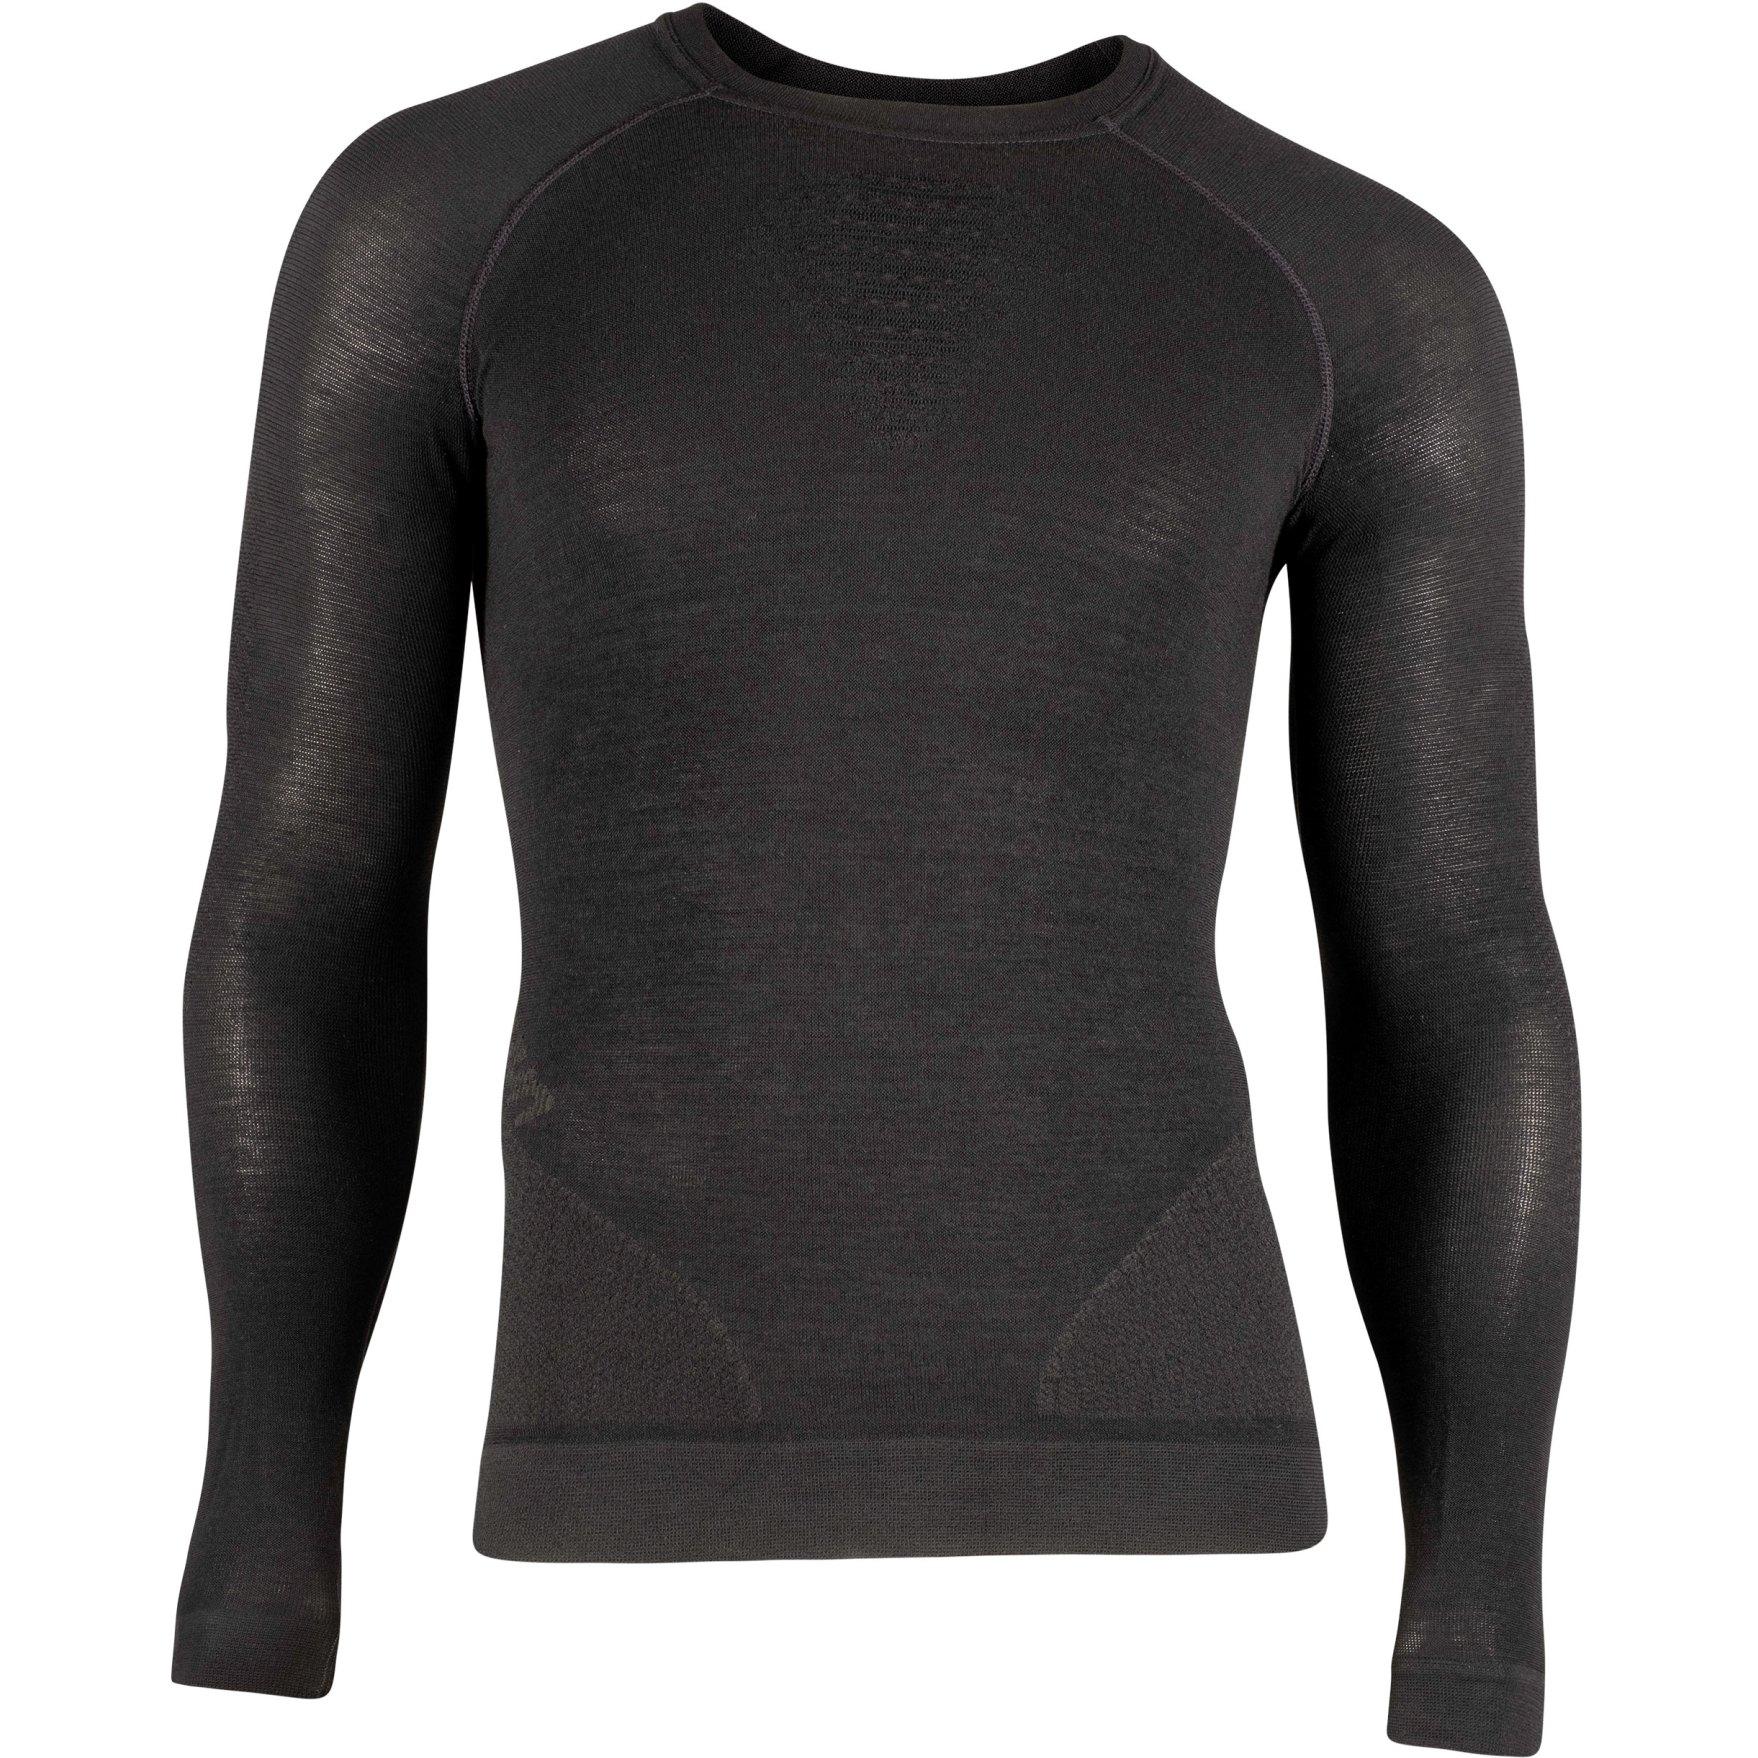 UYN Fusyon Herren Cashmere UW Langärmeliges Shirt - Black/Black